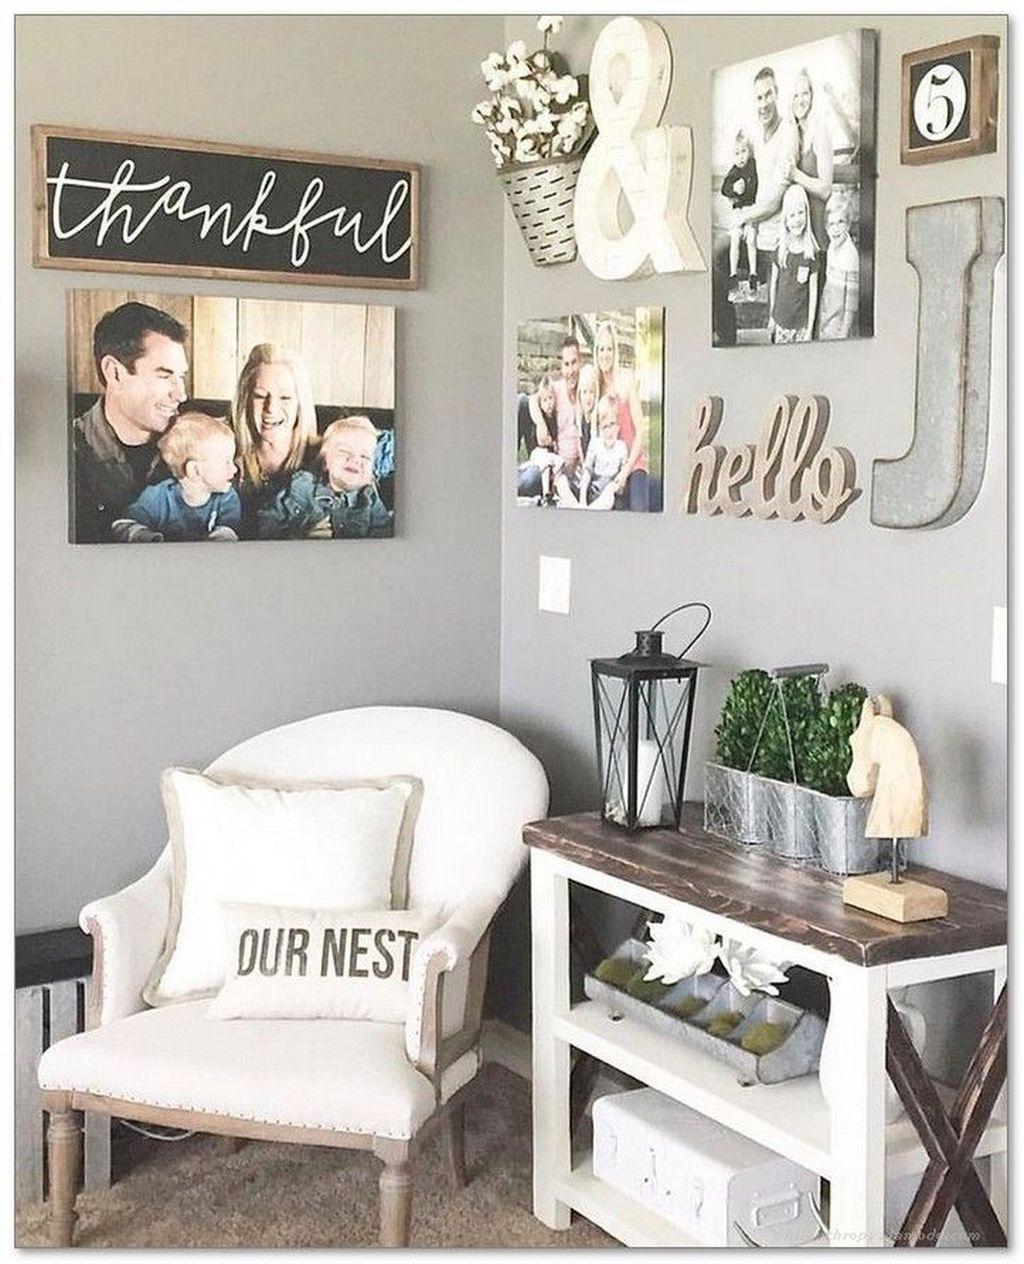 88 Rustic Farmhouse Living Room Decor Ideas | Farmhouse living rooms ...